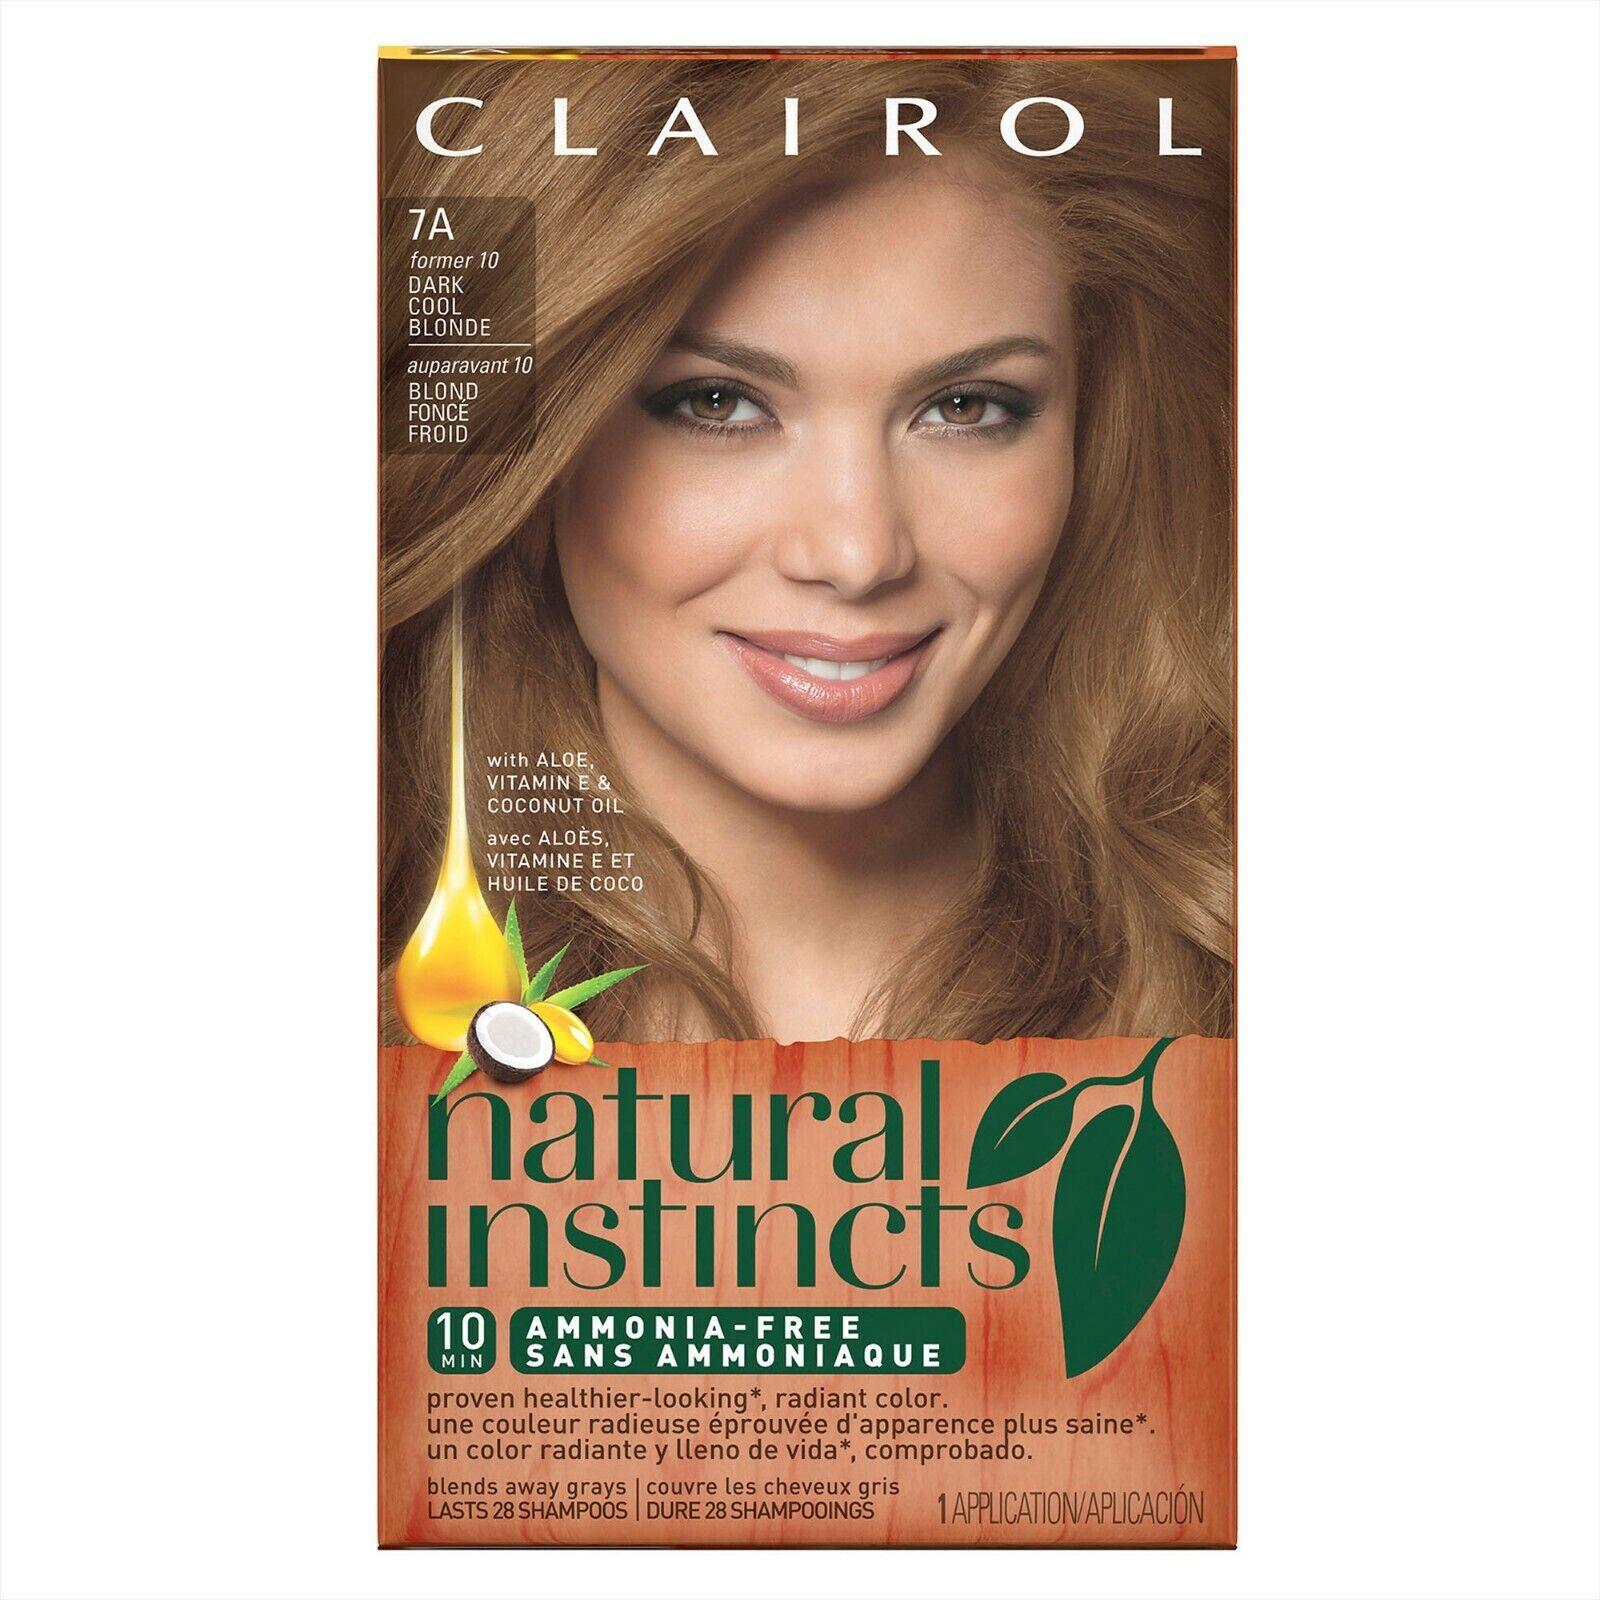 Clairol Natural Instincts Ammonia-Free 9N Dark Blonde, 1.0 C